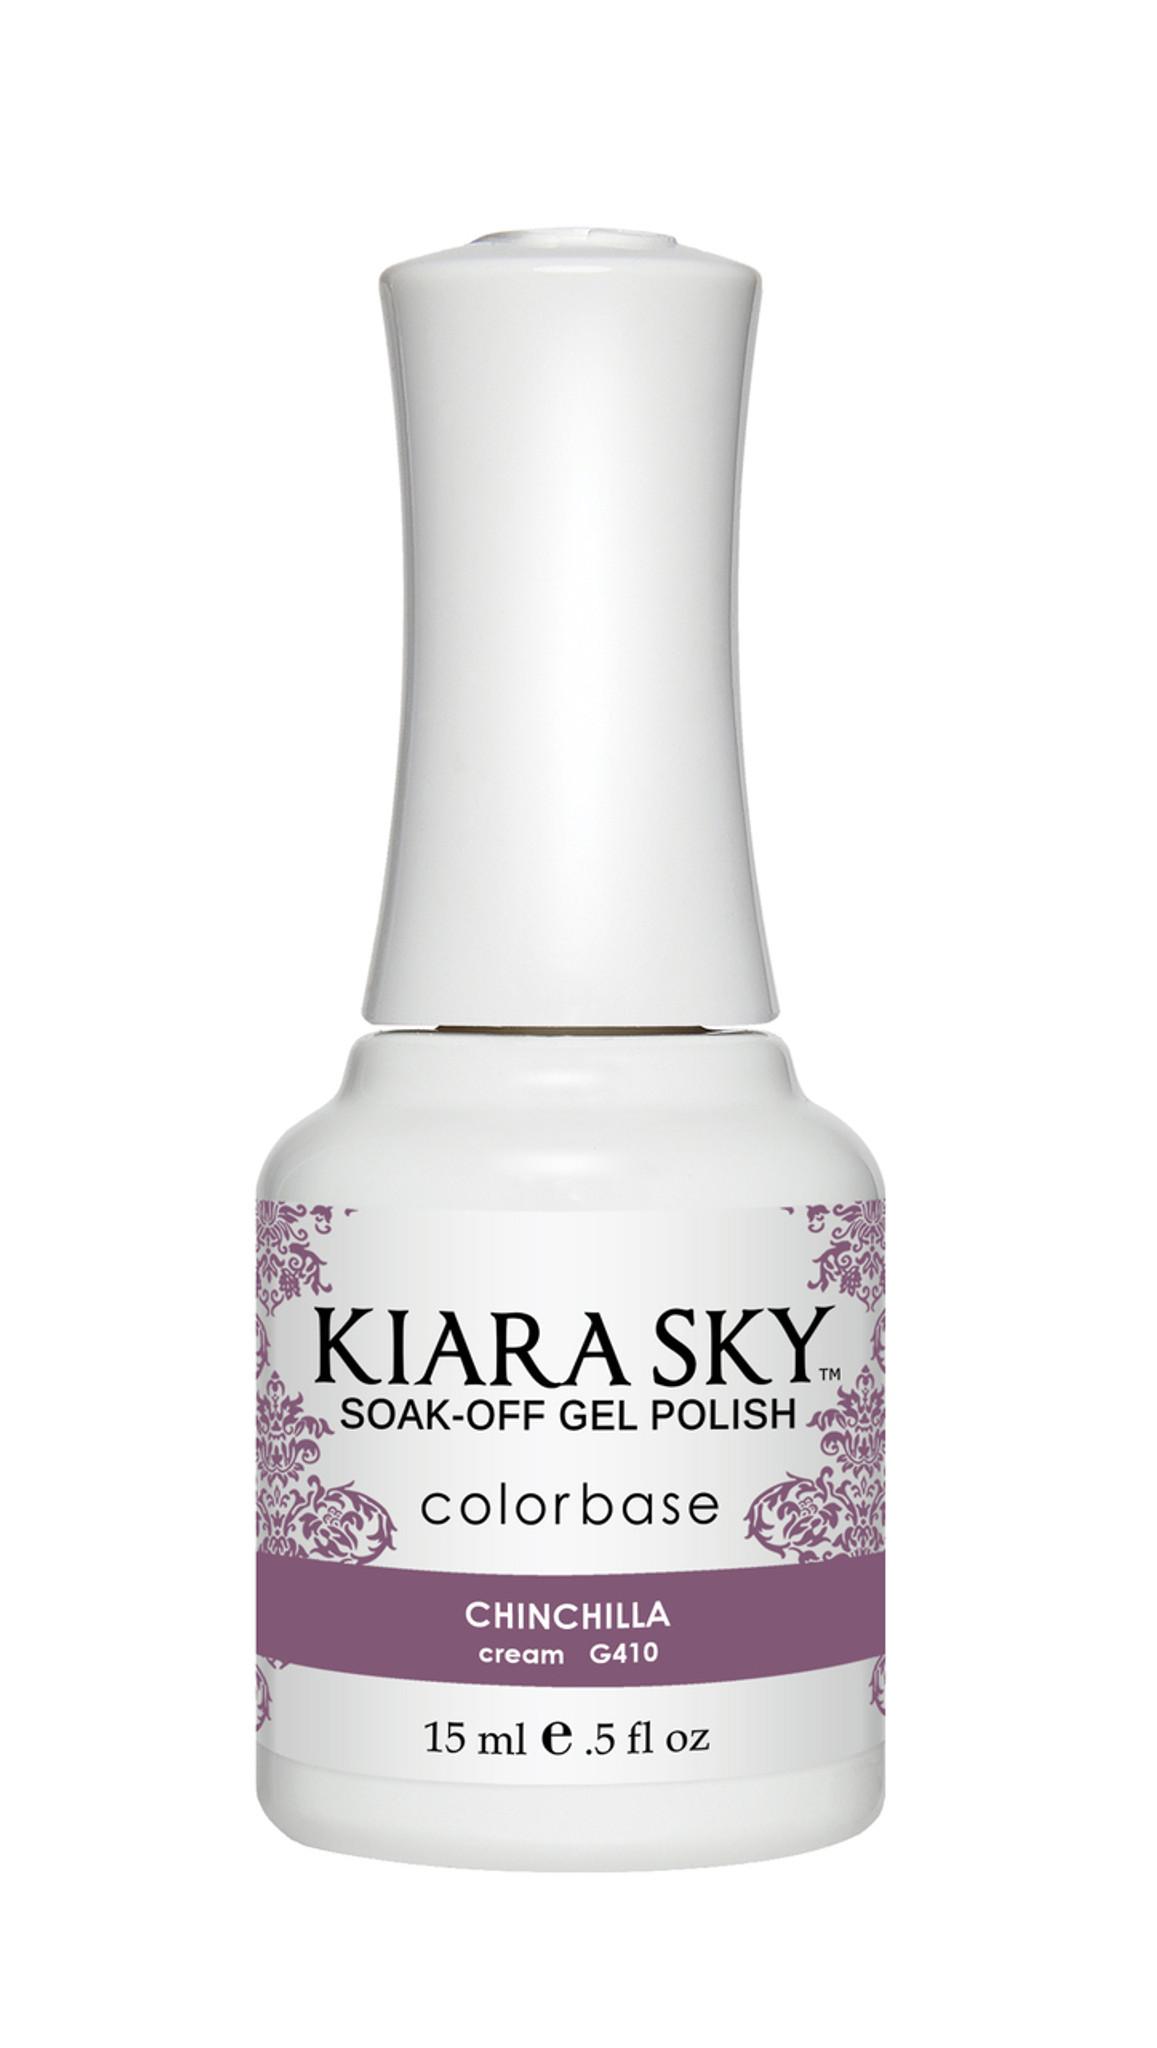 GEL POLISH - G410 CHINCHILLA - Kiara Sky Professional Nails